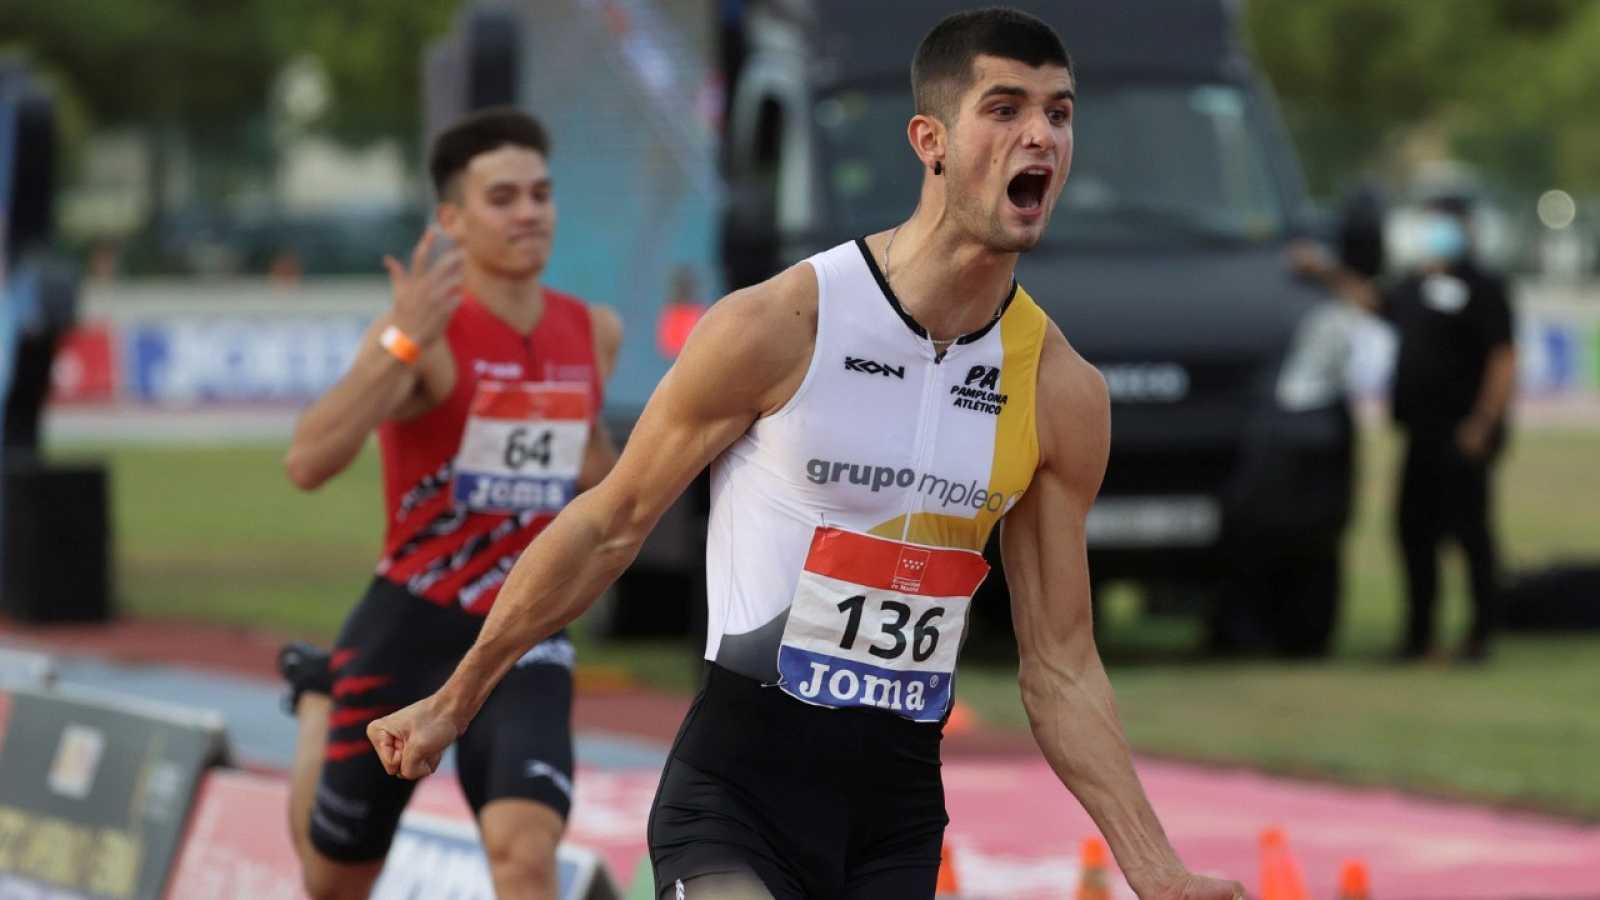 Asier Martínez,campeón de España de 110 metros vallas